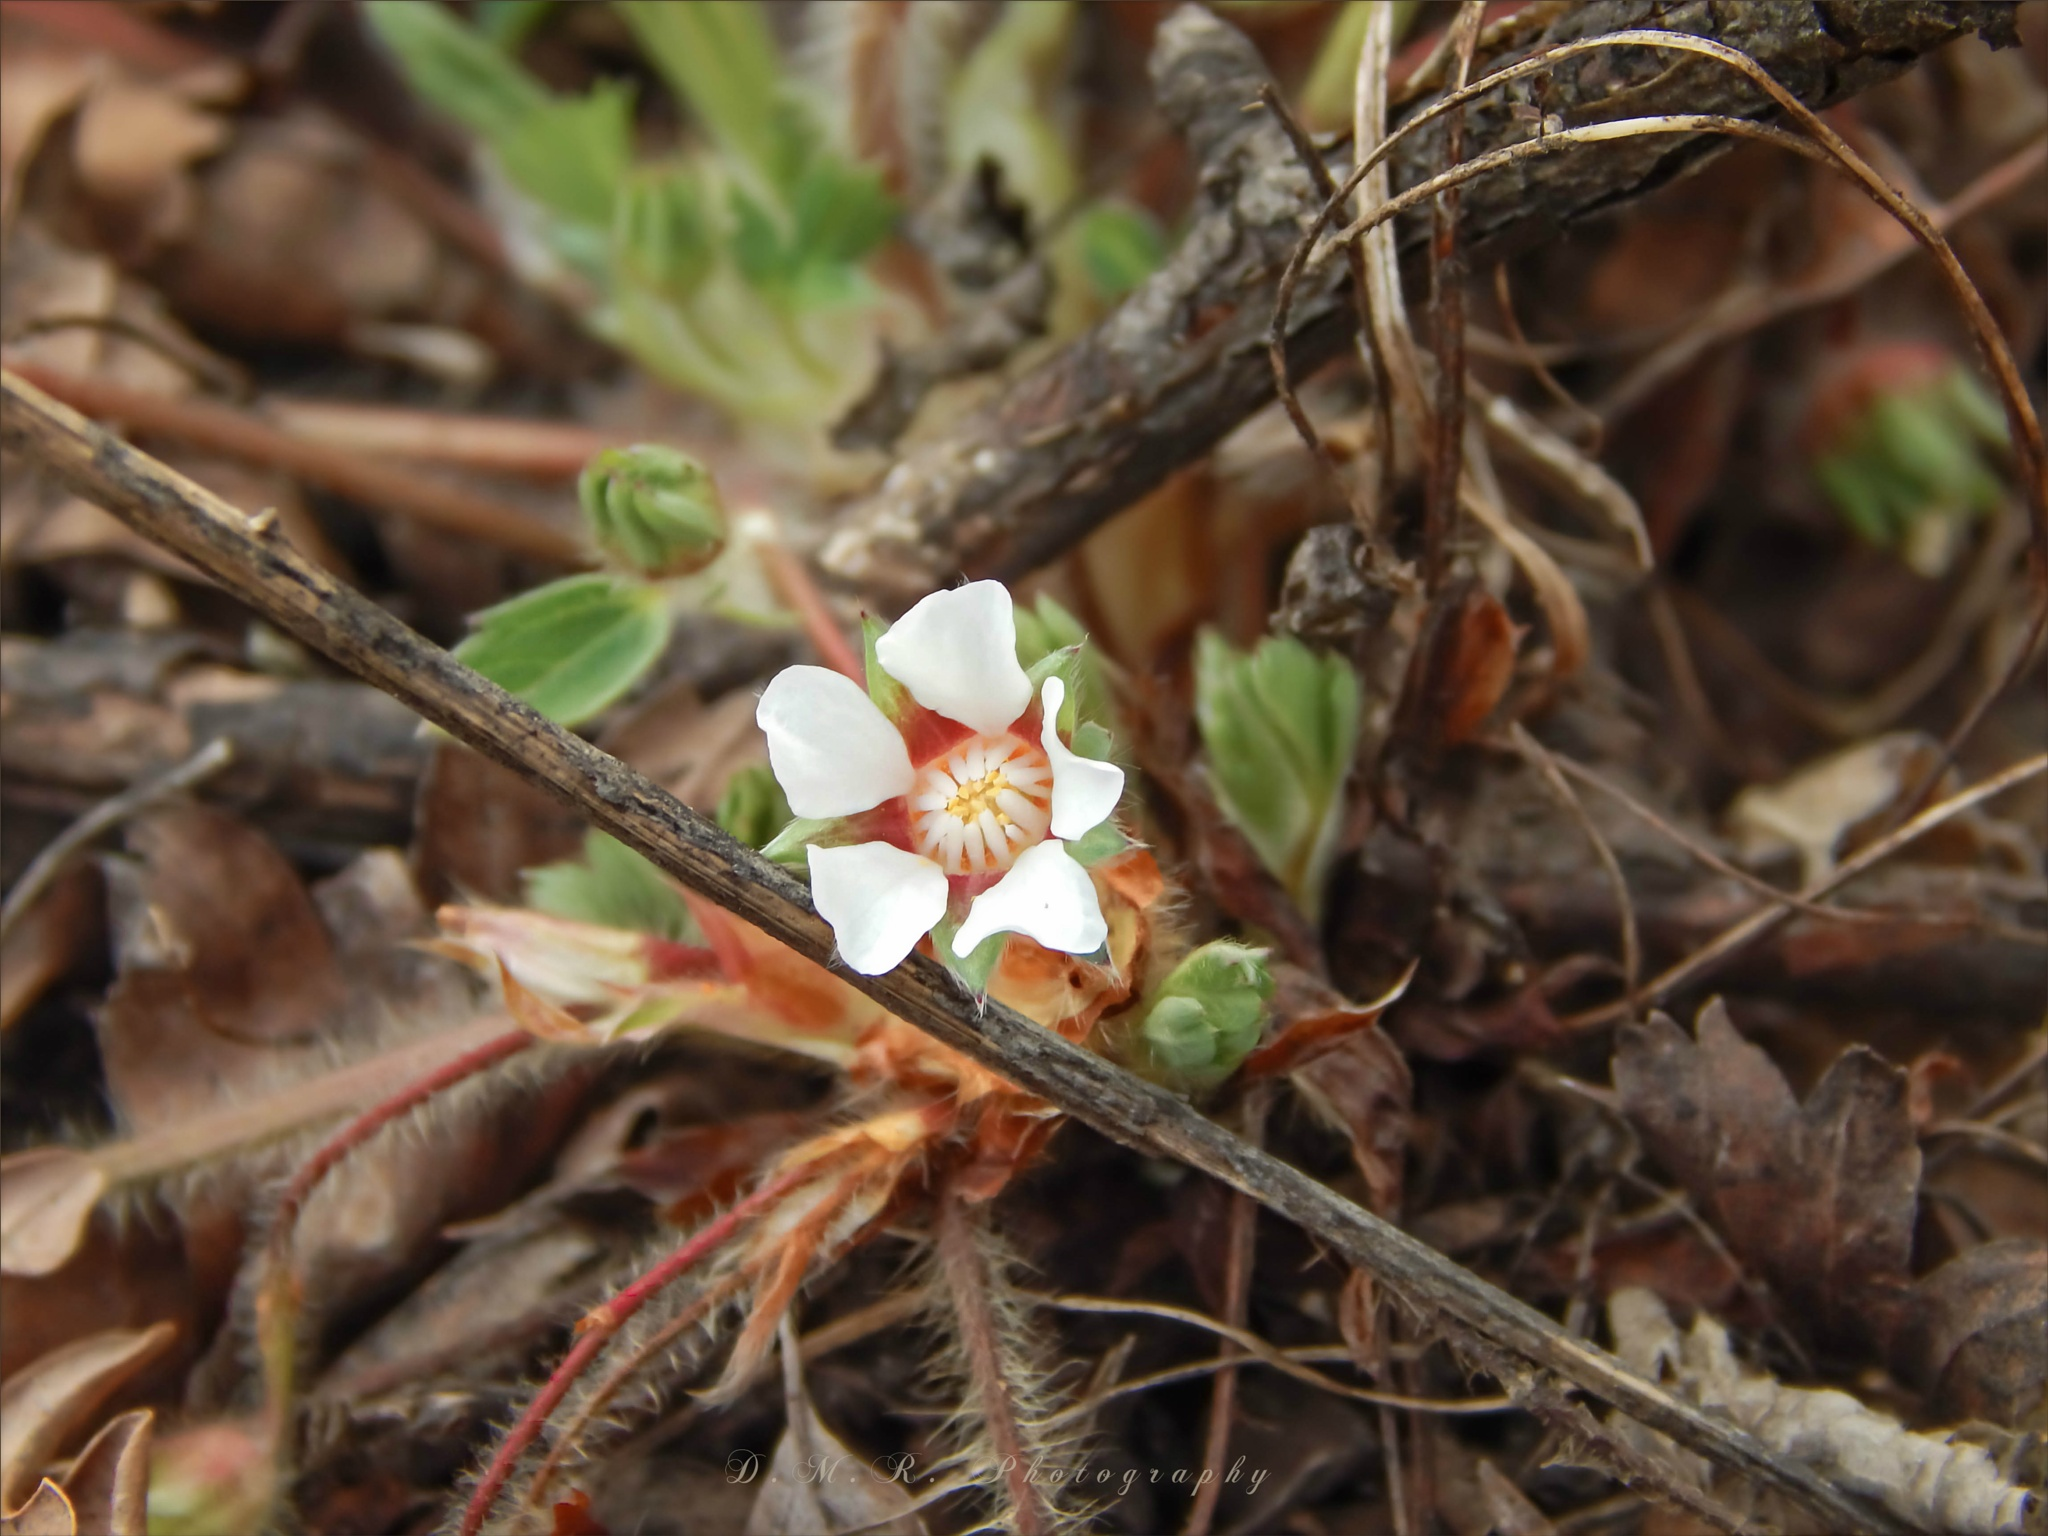 Potentilla micrantha L. ~ Barren strawberry ~ Jalova jagoda by Драгана М. Реџић